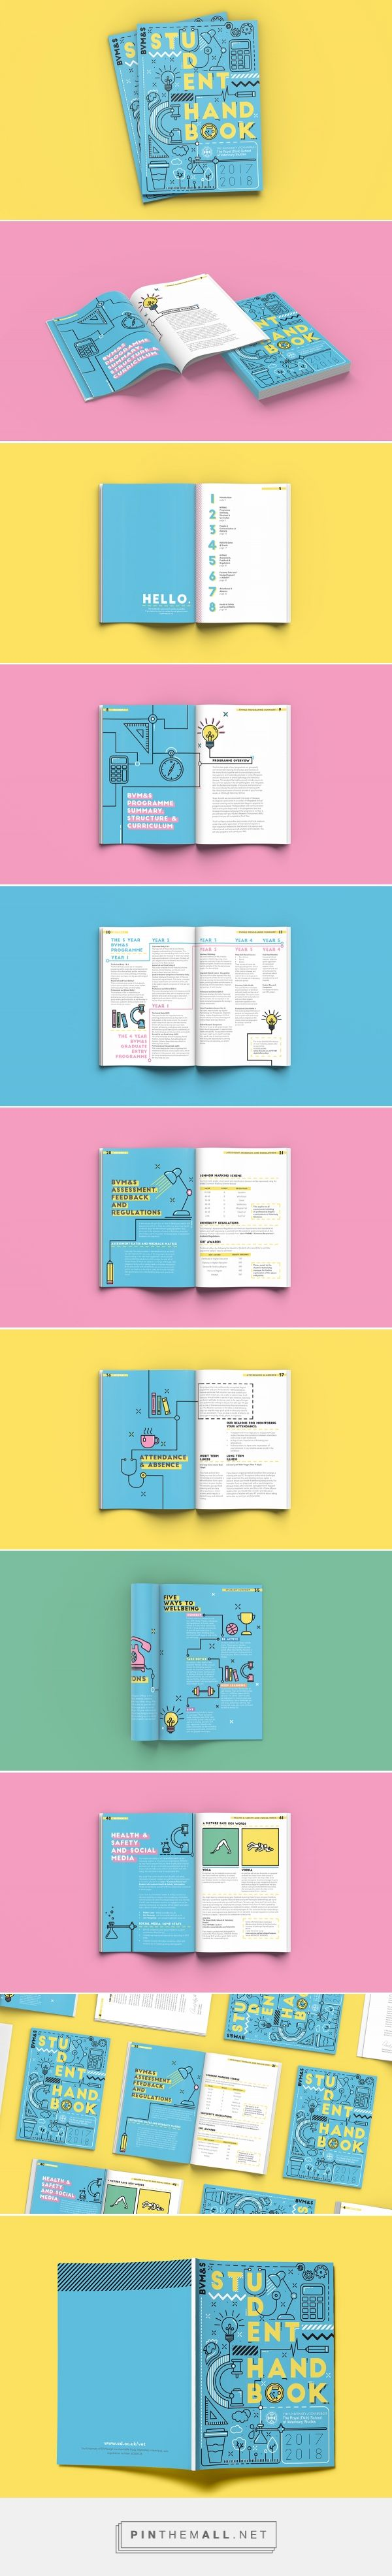 UoE Vet School Student Handbook on Behance - created via https://pinthemall.net